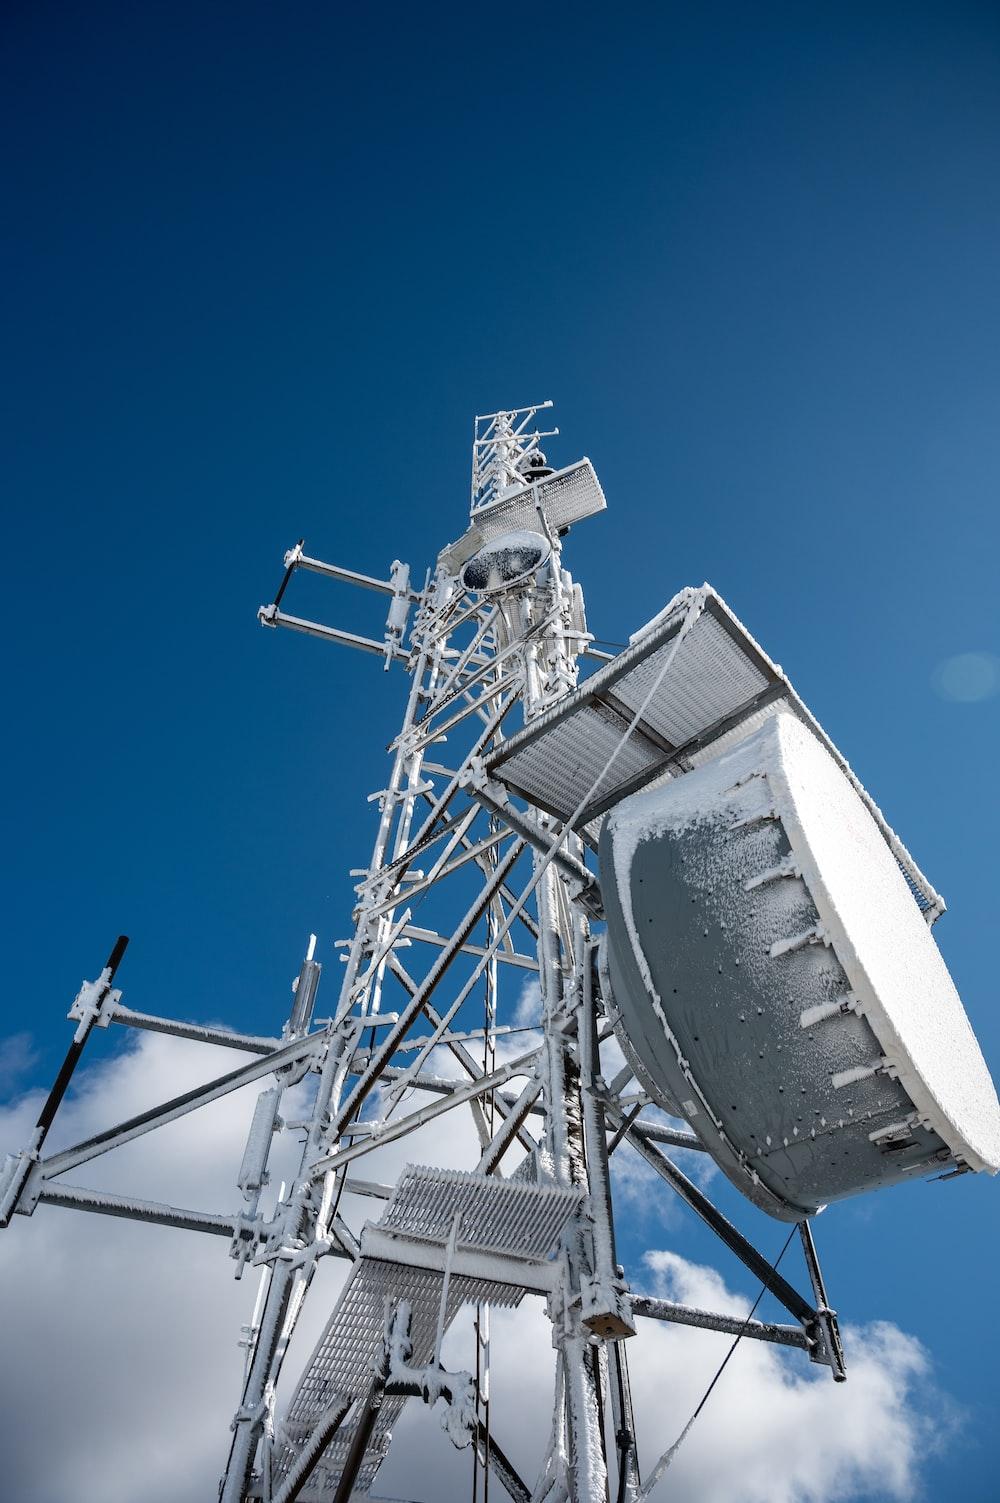 white and gray satellite under blue sky during daytime